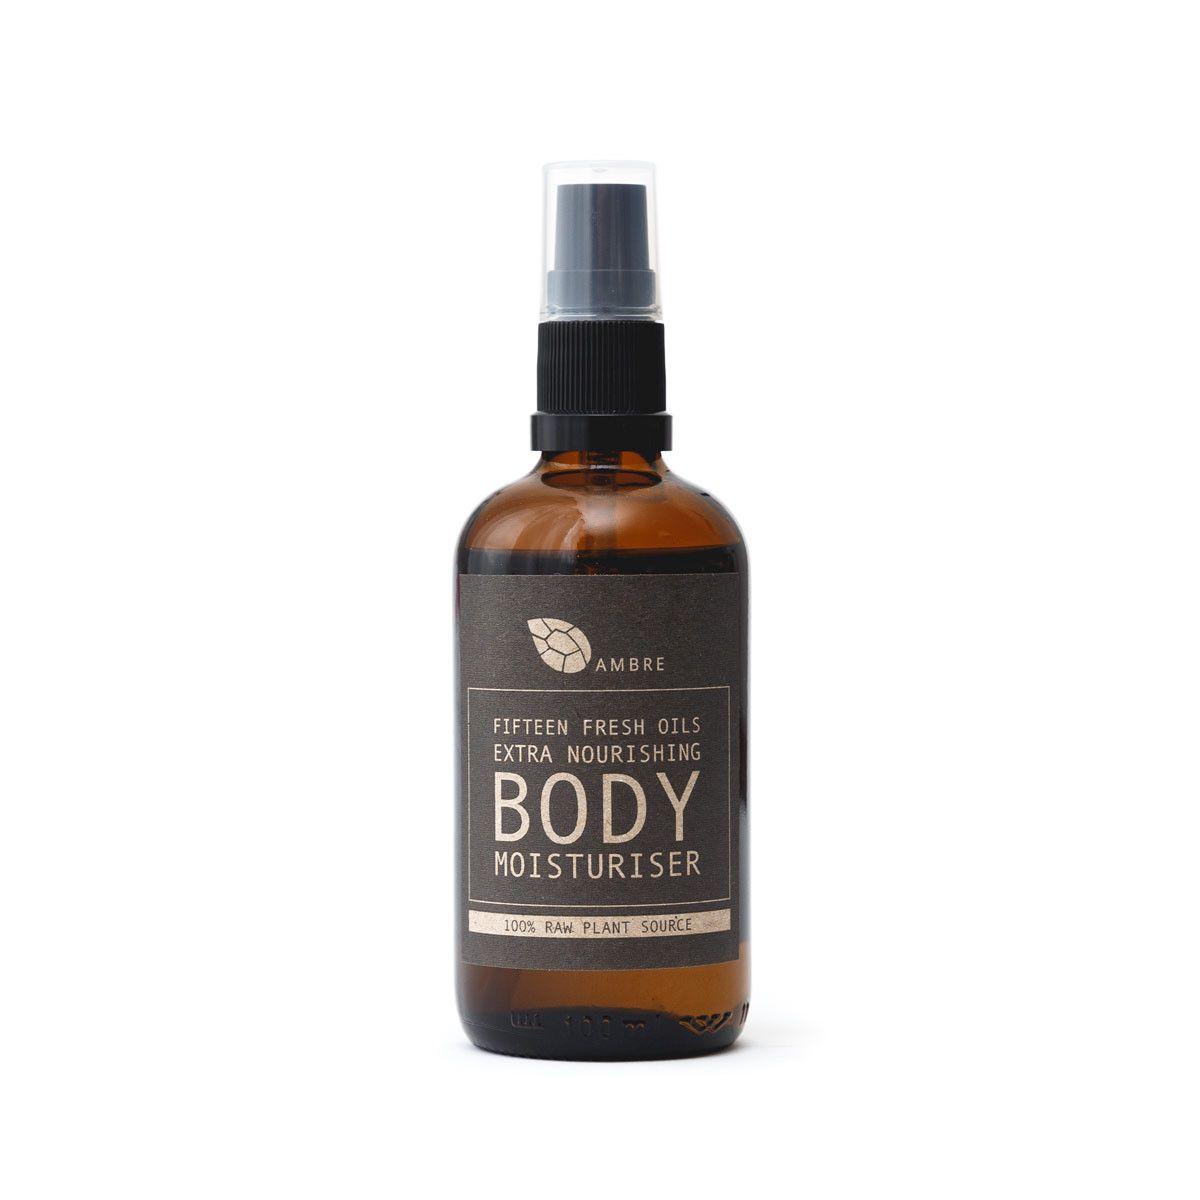 15 Fresh Oils Body Moisturiser The Future Kept 1